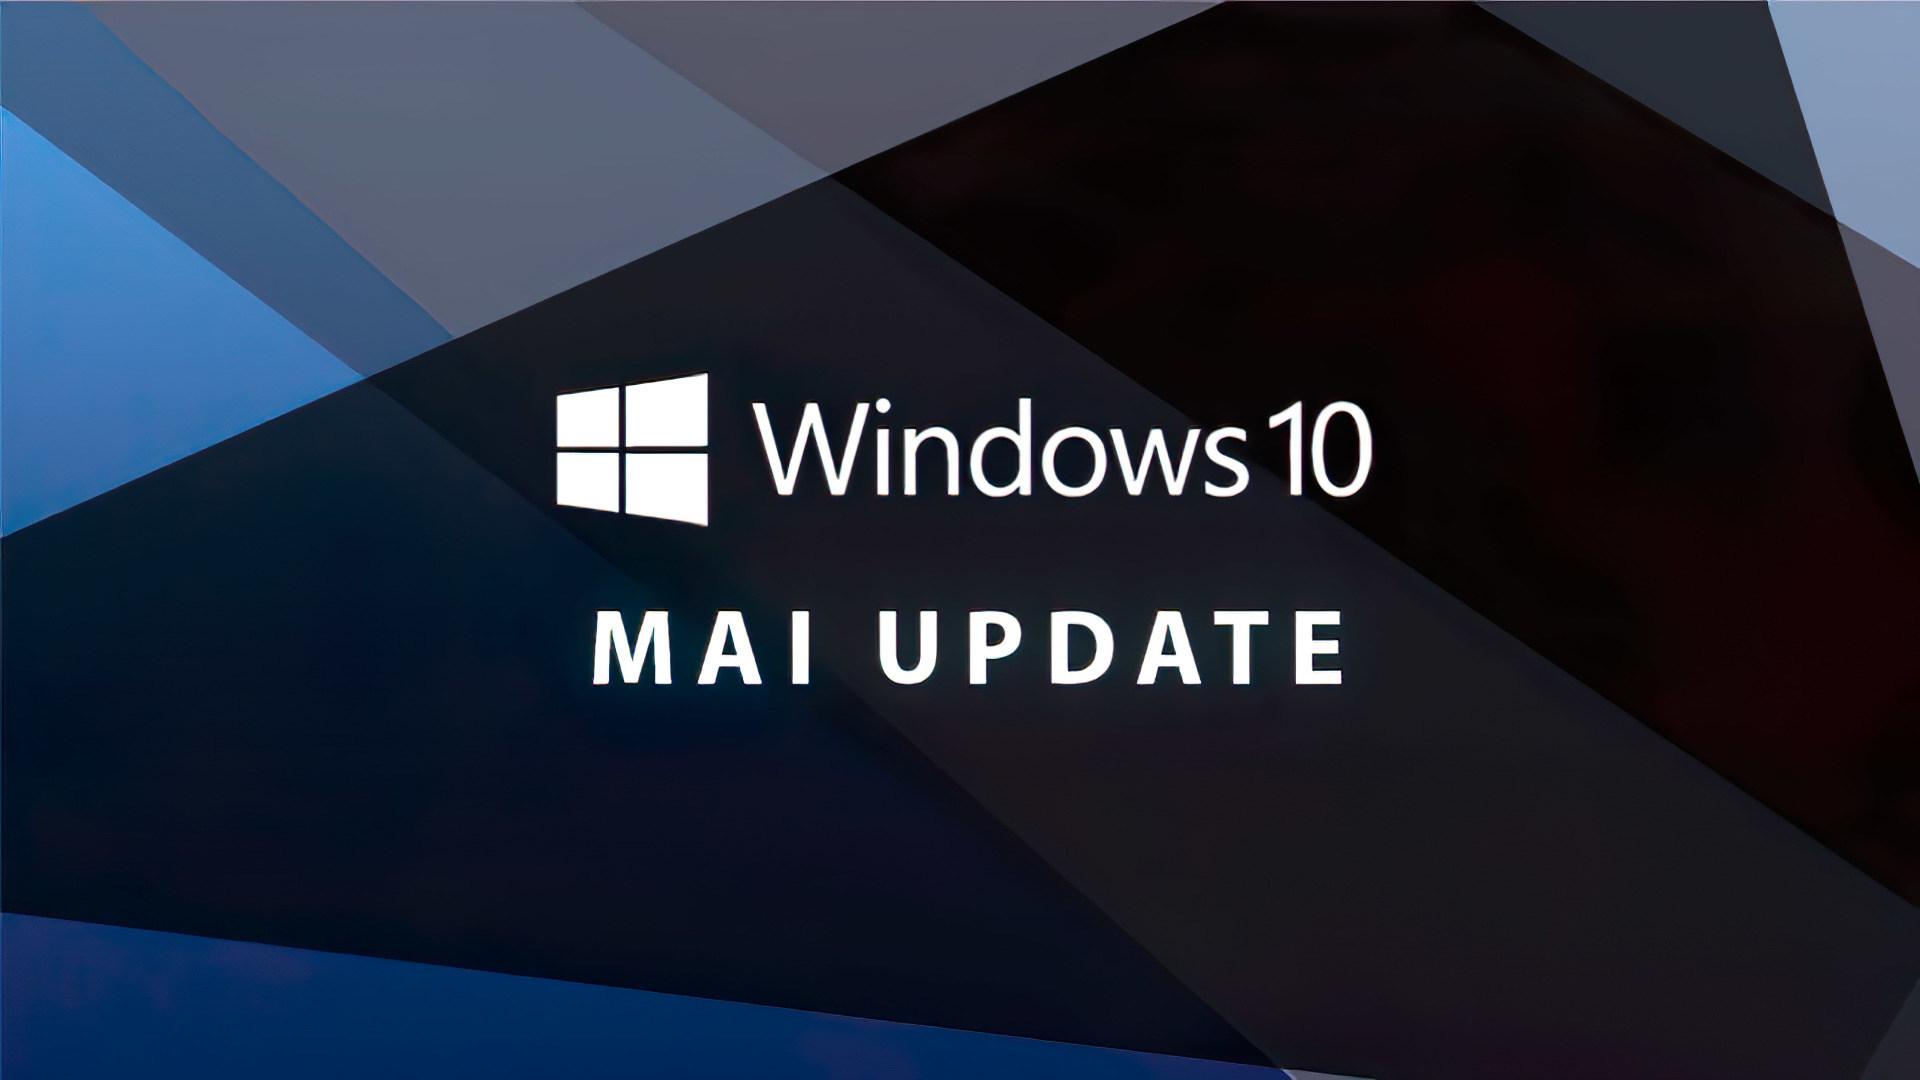 Microsoft, Betriebssystem, Windows 10, Windows, 20H1, Windows 10 Mai Update, Windows 10 Version 2004, Windows 10 Frühlings Update